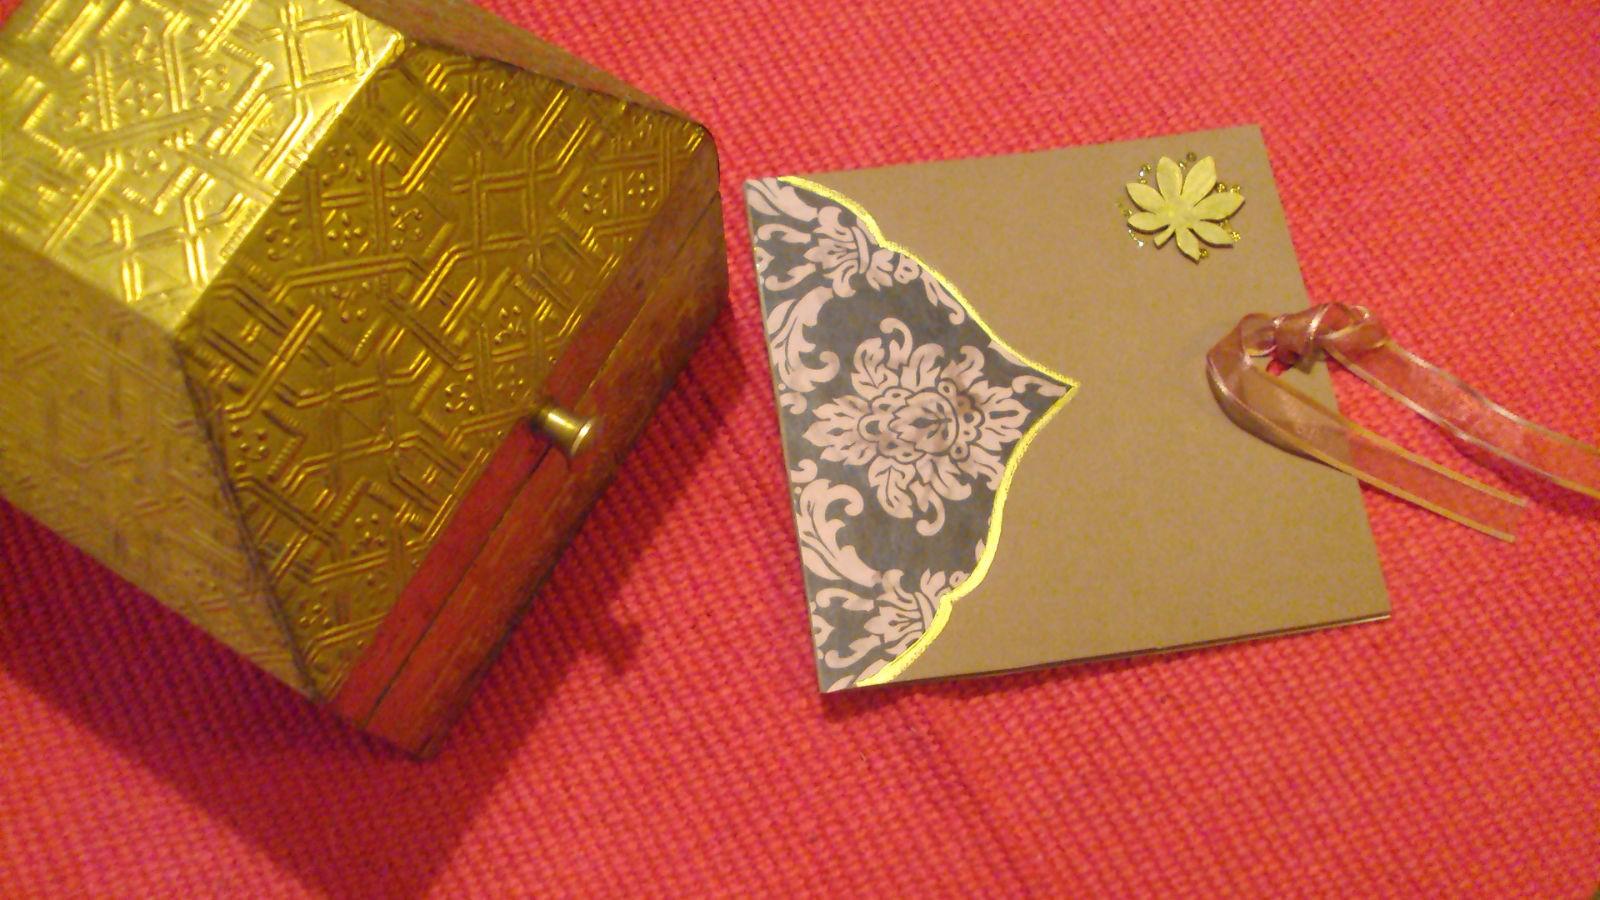 dossier aïd al-adha - jasmine and co - diy et tuto de décoration